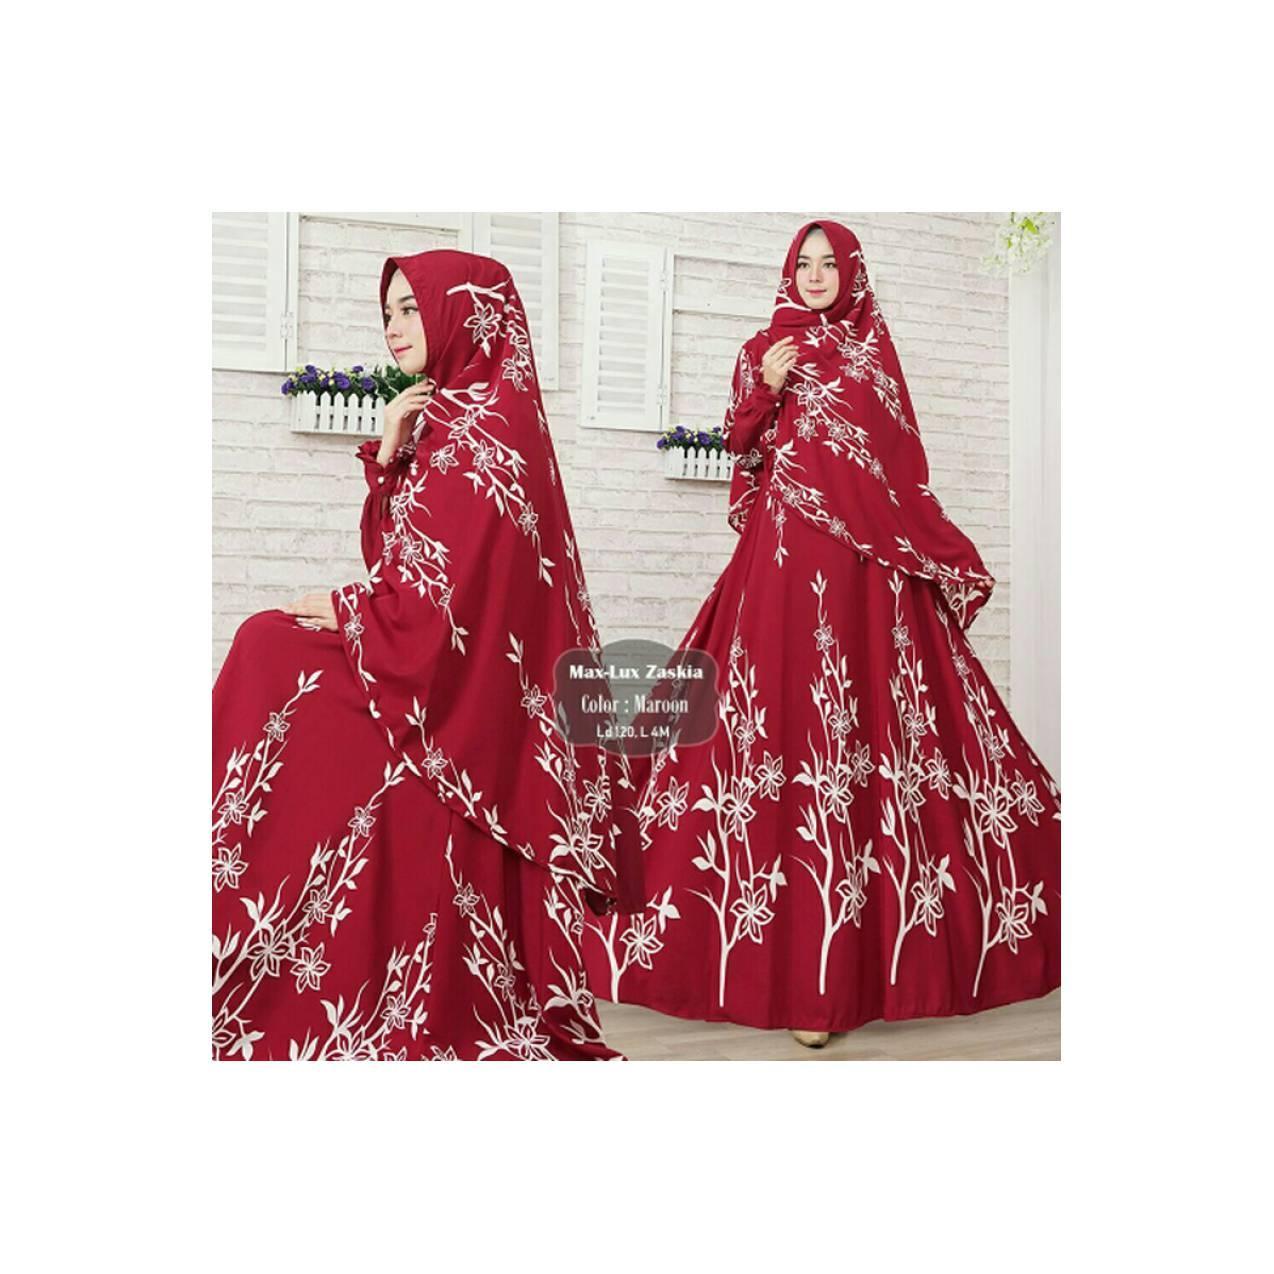 Baju Muslim wanita Gamis Muslimah Syari Premium MaxLuv Zaskia Maroon